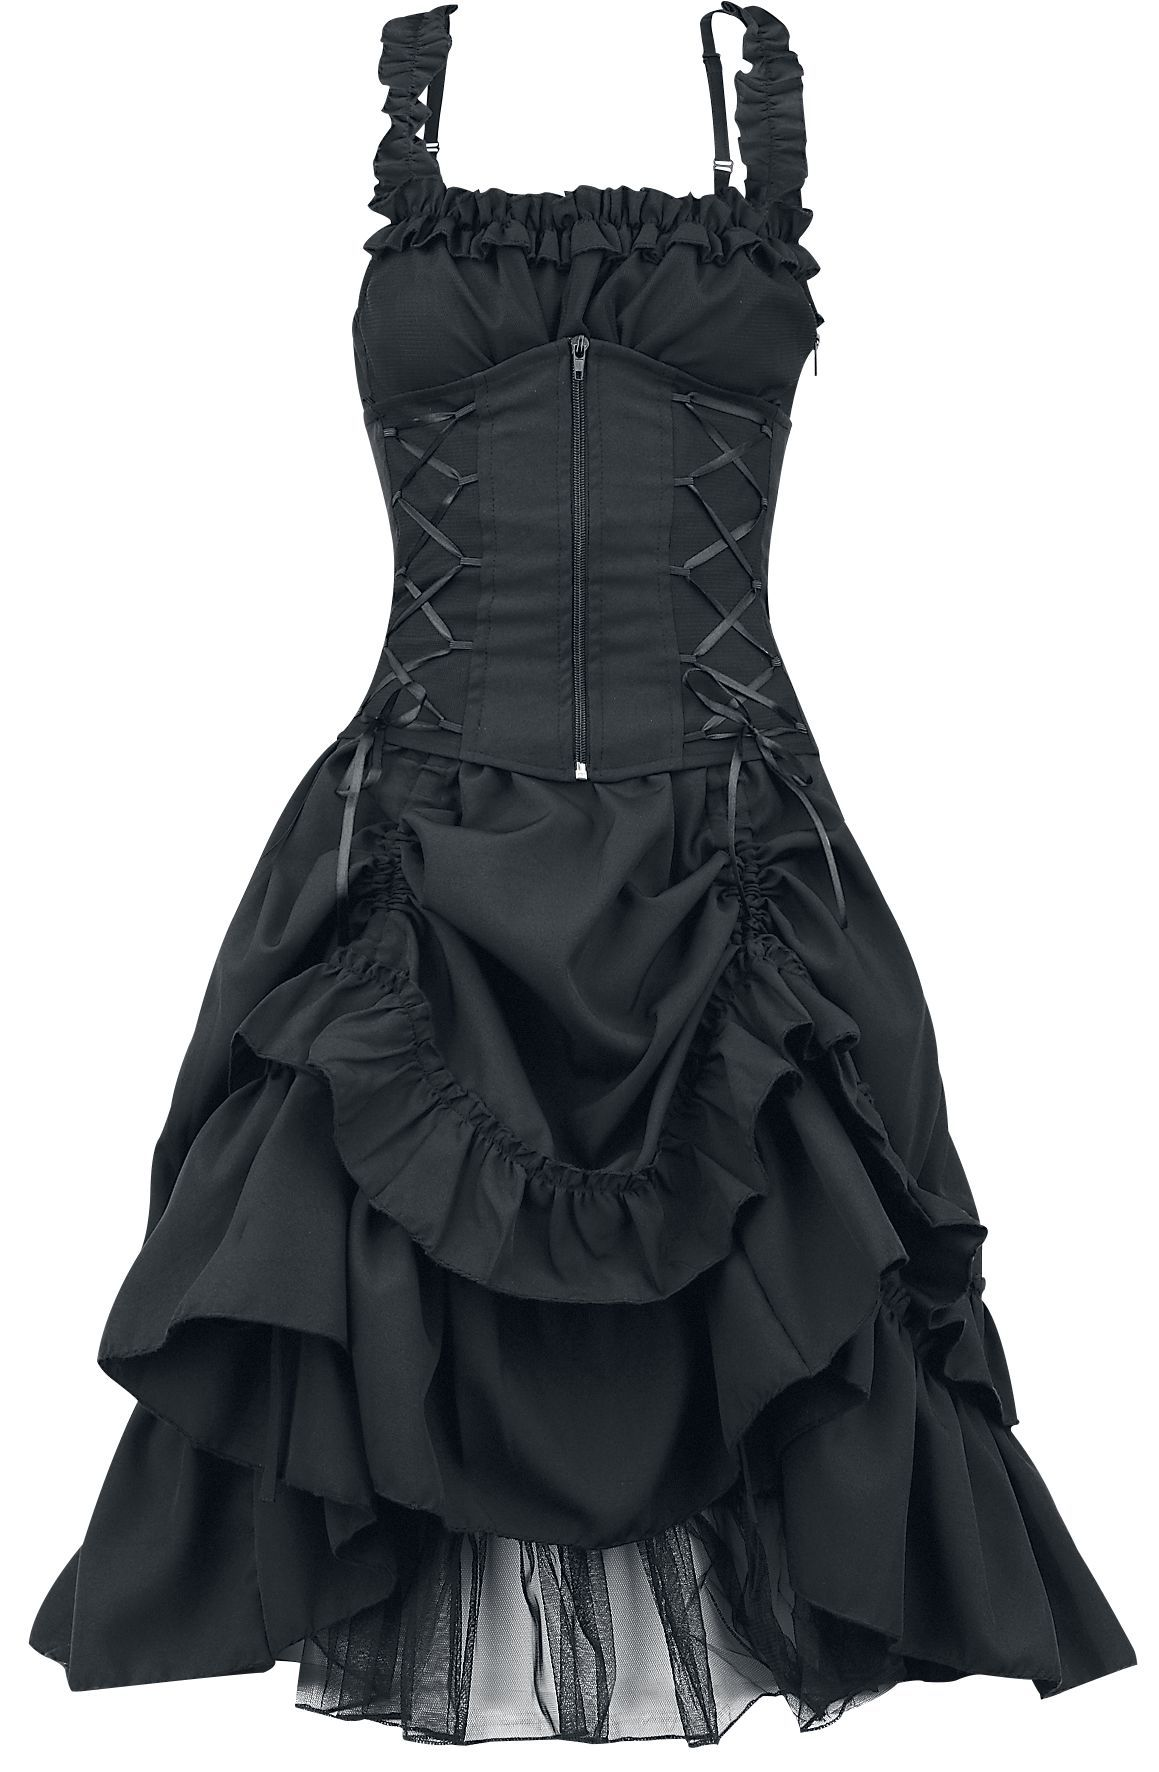 Soul dress a gothic clothing love affair pinterest gothic